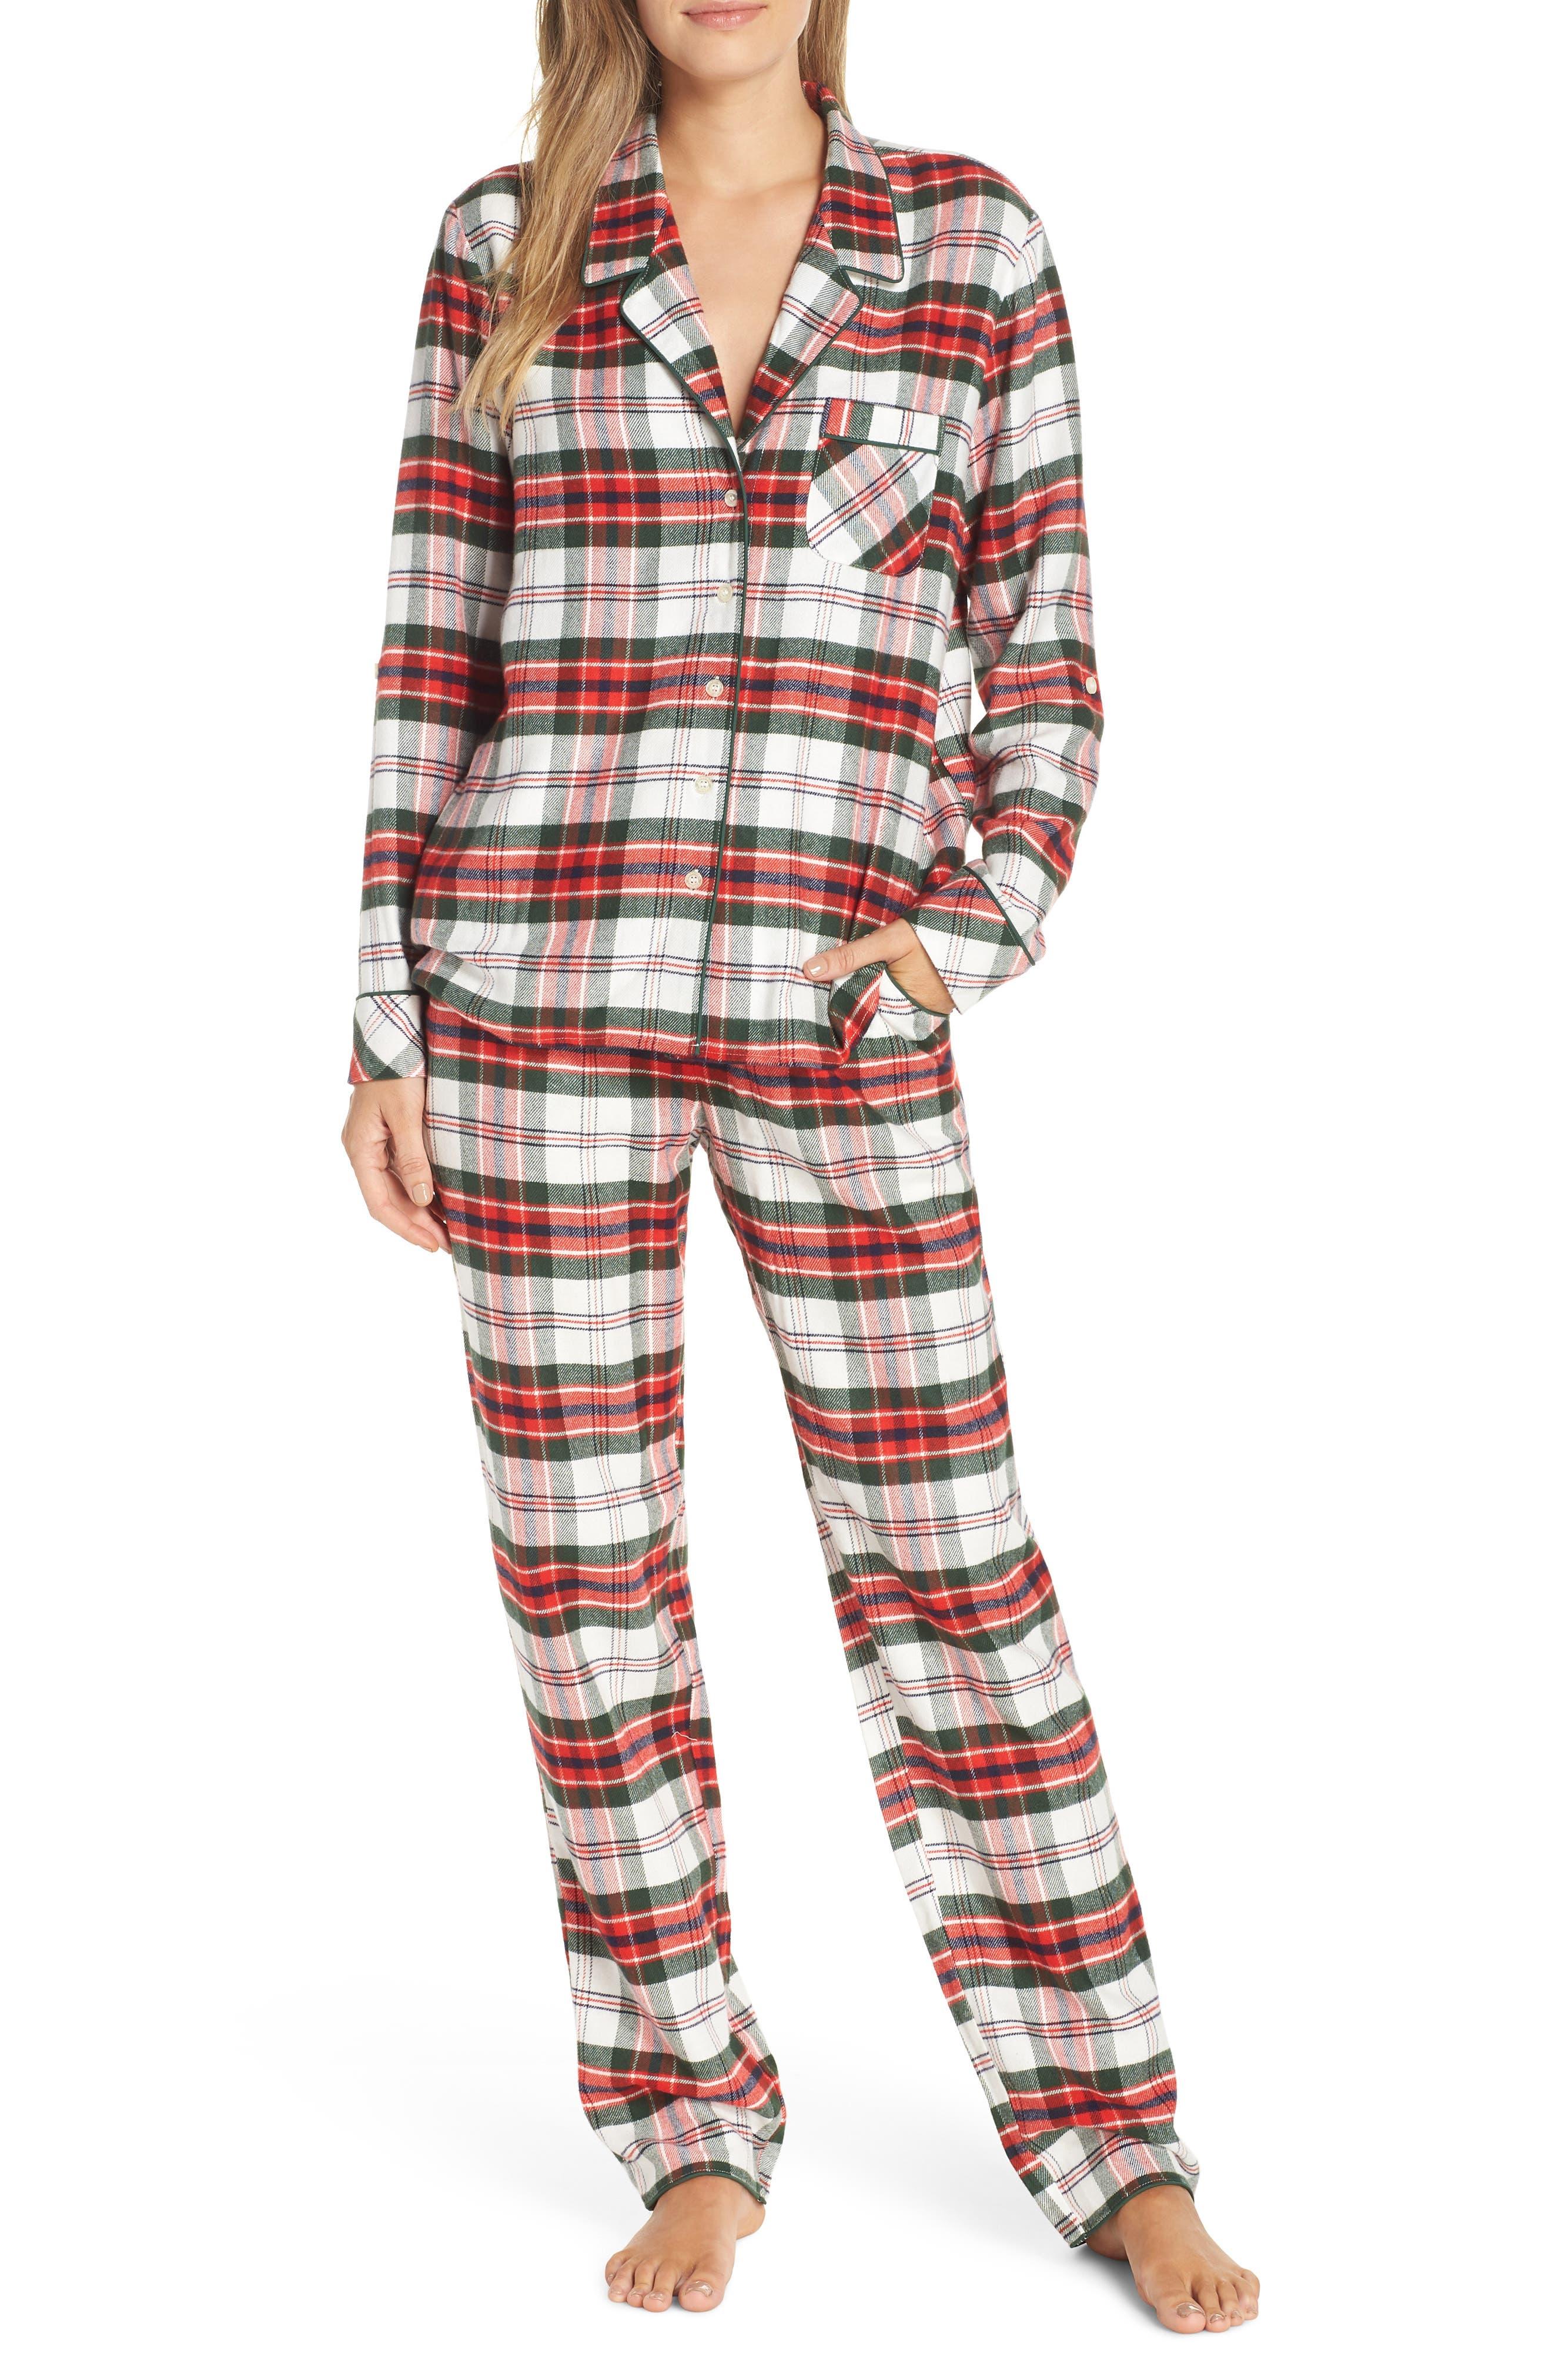 Nordstrom Lingerie Starlight Flannel Pajamas, Ivory